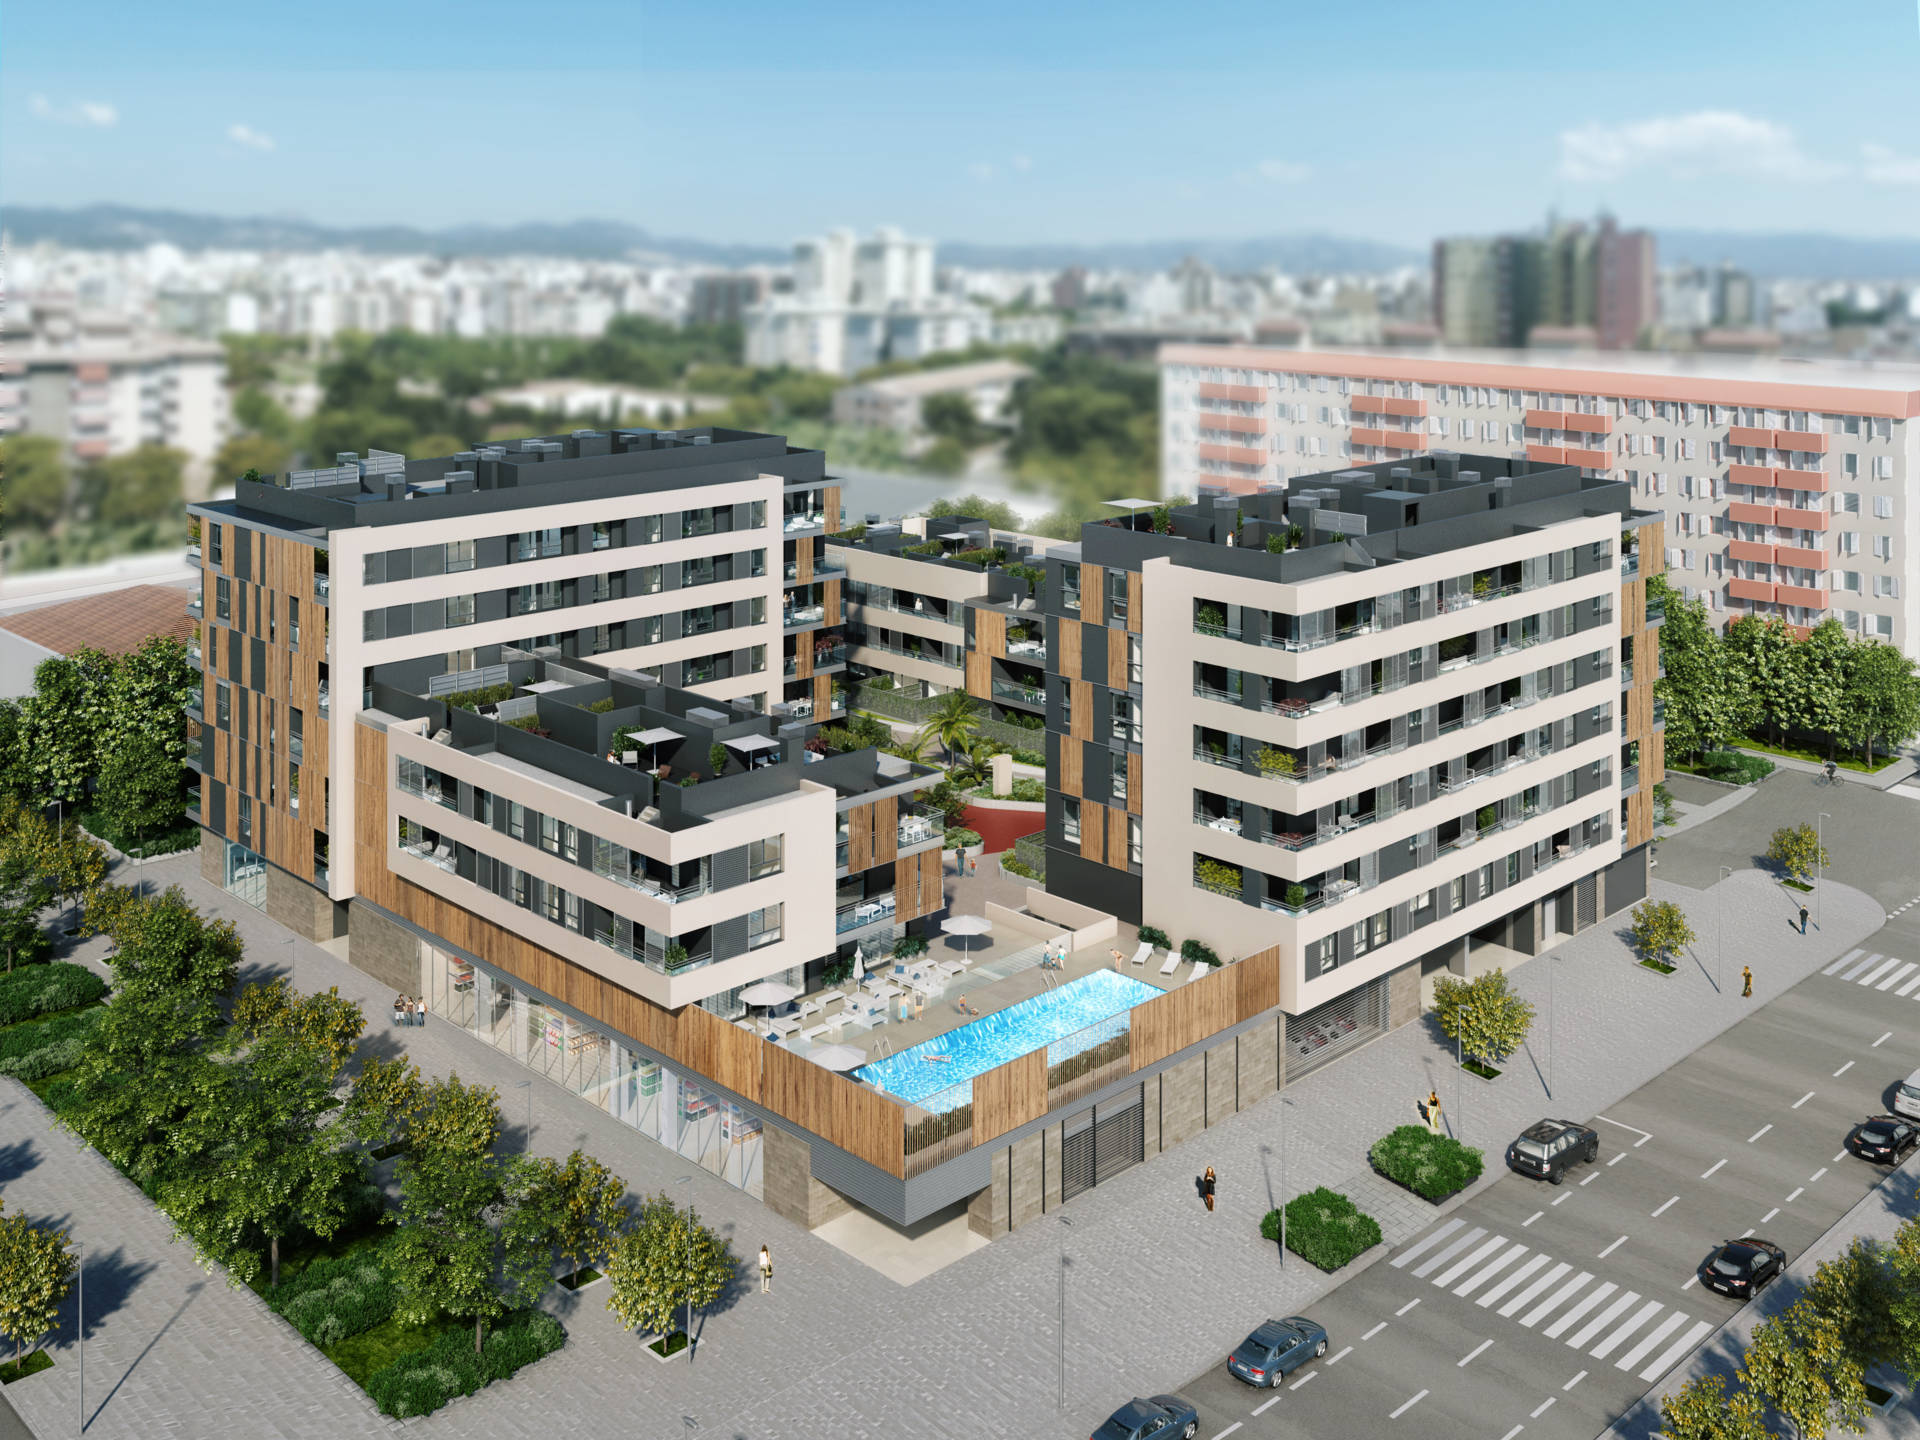 viviendas de obra nueva en Nou Llevant Palma de Mallorca